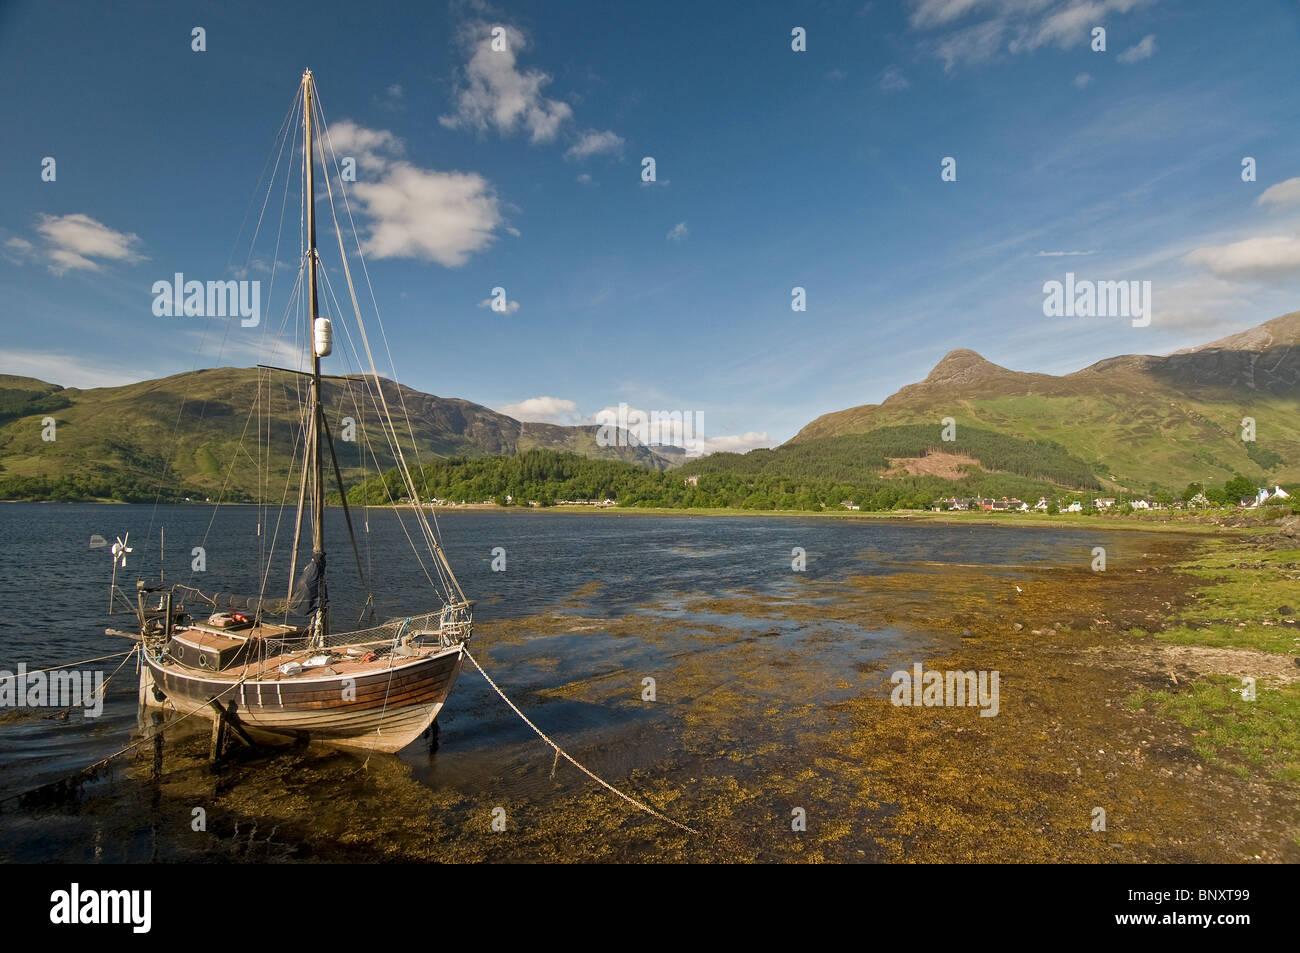 Yacht on Loch Leven, Ballachulish, Glencoe,  Inverness-shire, Highland Region. Scotland.  SCO 6218 - Stock Image